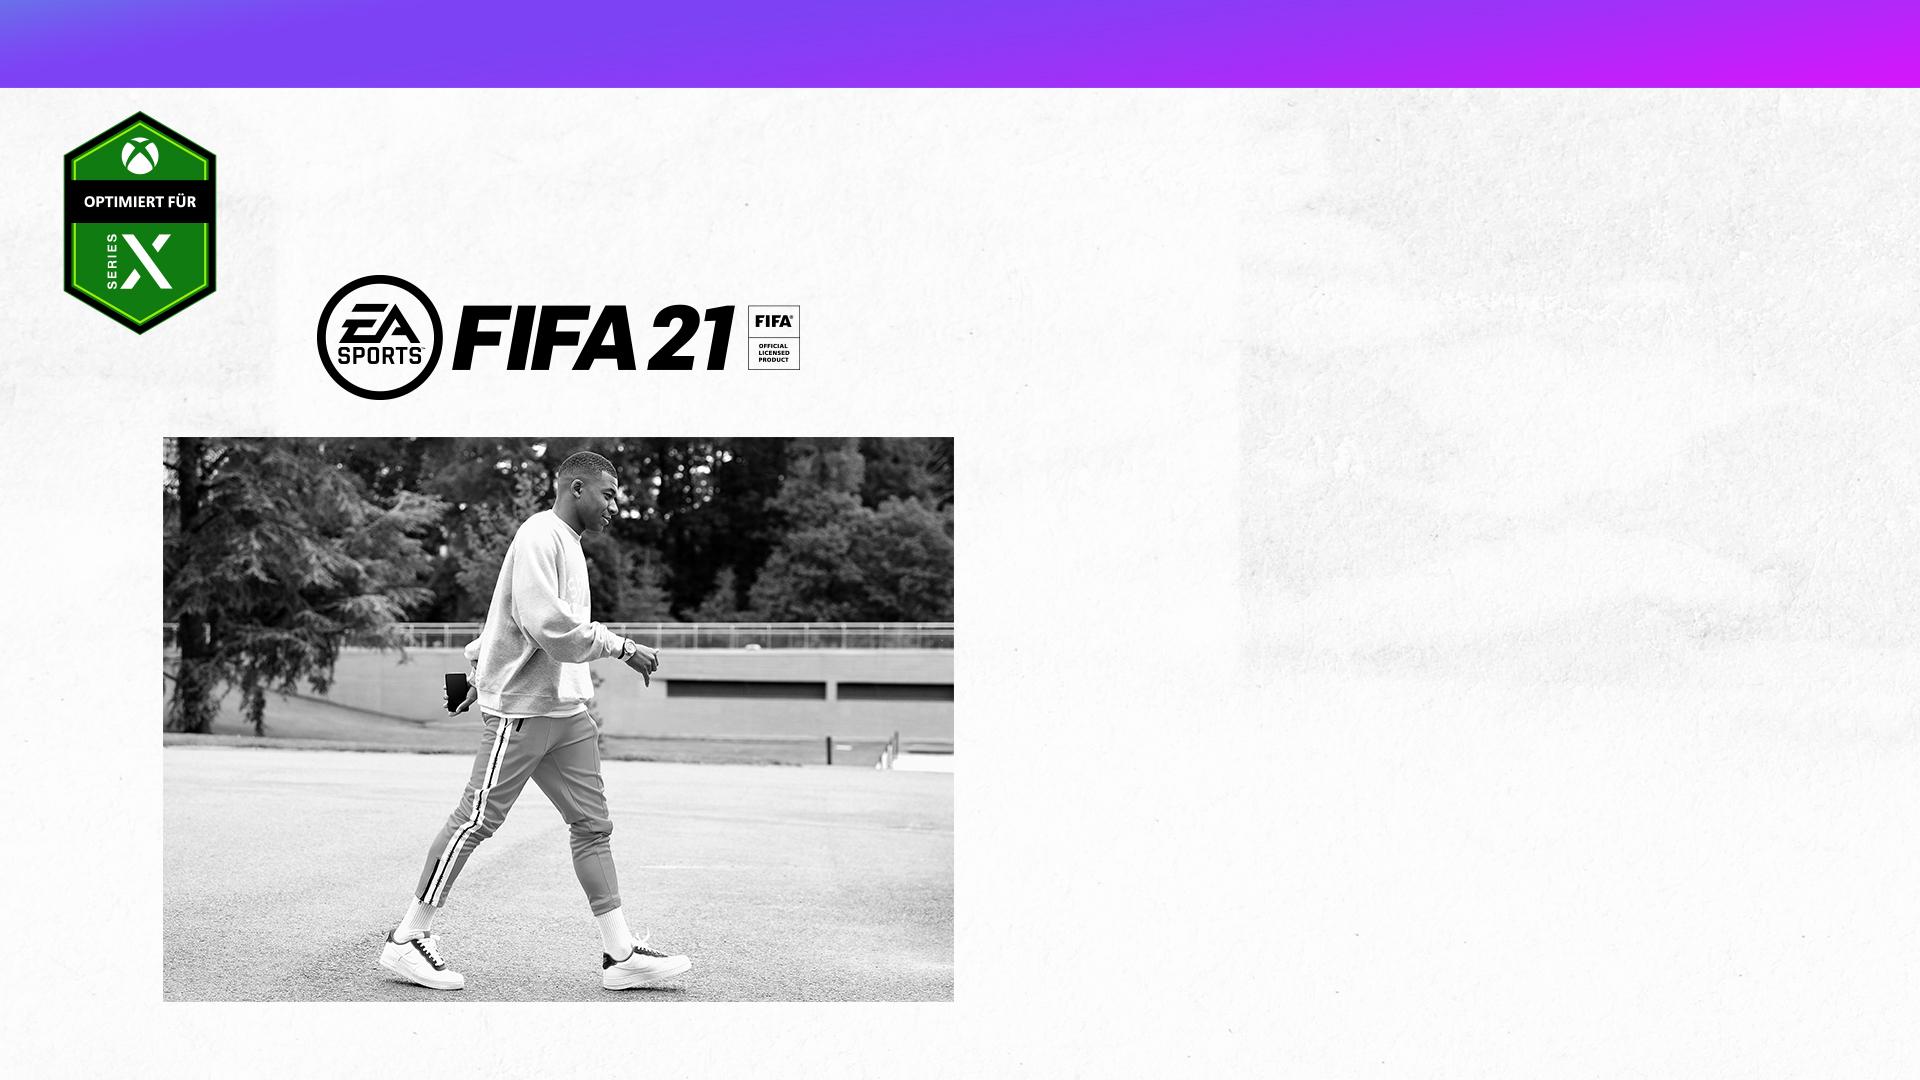 Optimiert für Xbox Series X, EA Sports-Logo, FIFA 21, offizielles FIFA-Lizenzprodukt, Kylian Mbappé gehend